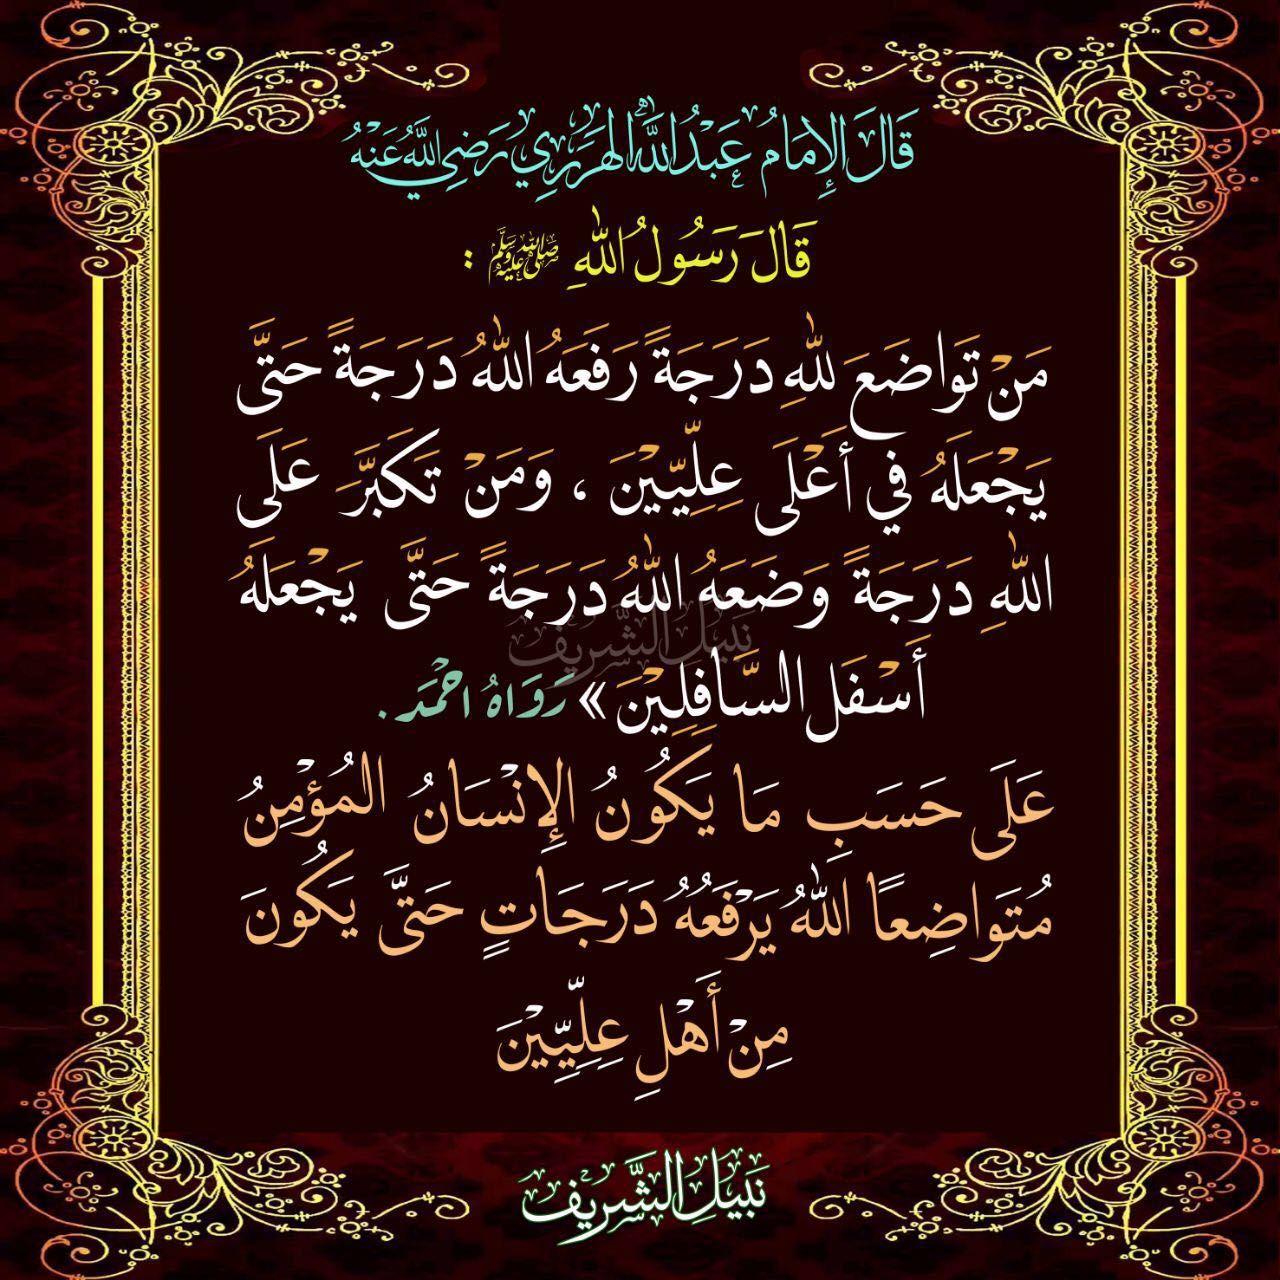 Pin By Alsunniy On معلومات إسلامية Art Quotes Chalkboard Quote Art Islamic Art